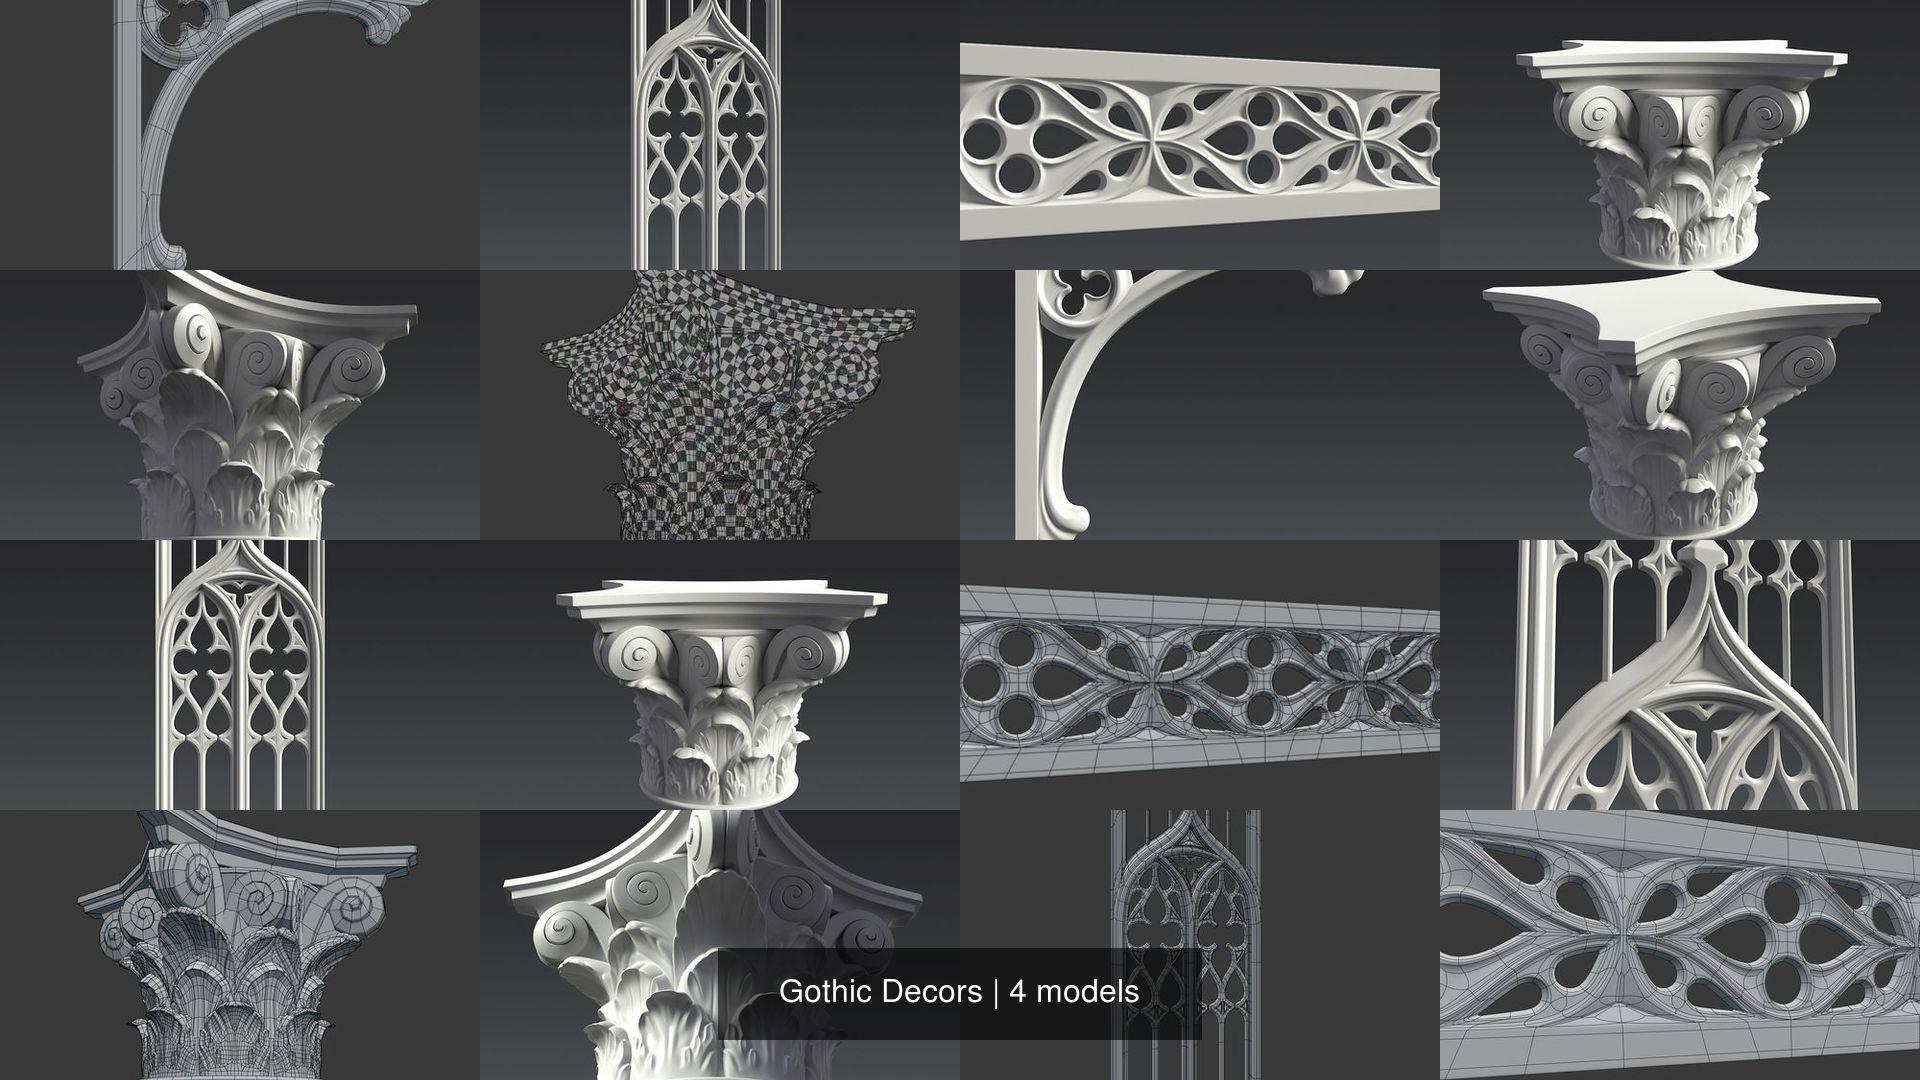 Gothic Decors